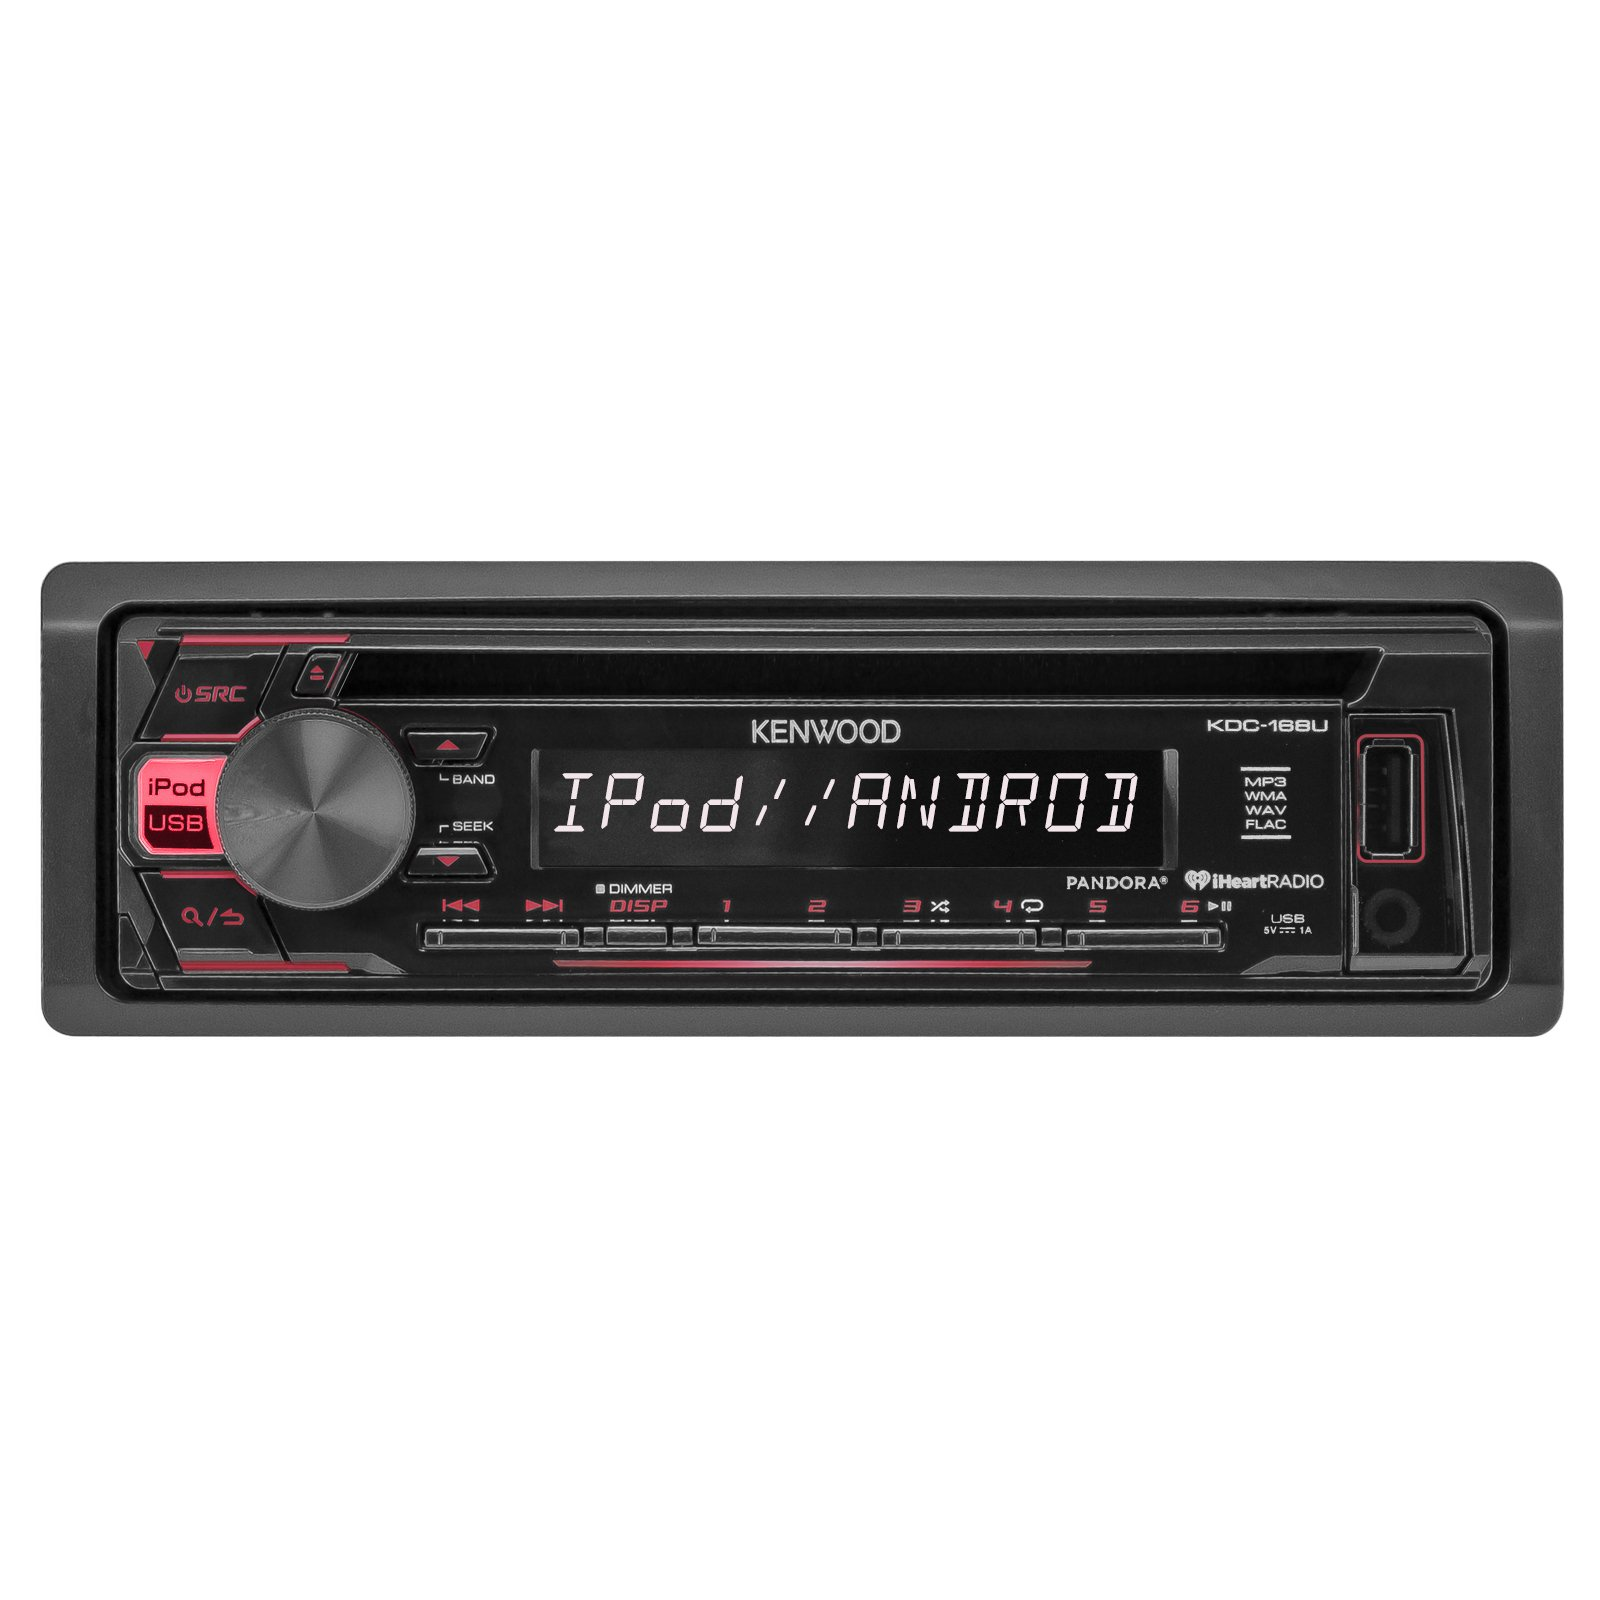 Kenewood KDC168U Car Radio USB AUX CD Player Receiver - Bundle With 2x TSA1676R 6.5'' 3-Way Car Audio Speakers - 2x 6.5''-6.75'' 4-Way Stereo Speaker + Enrock 50Ft 18 Gauge Speaker Wire by EnrockAutomotiveBundle (Image #2)